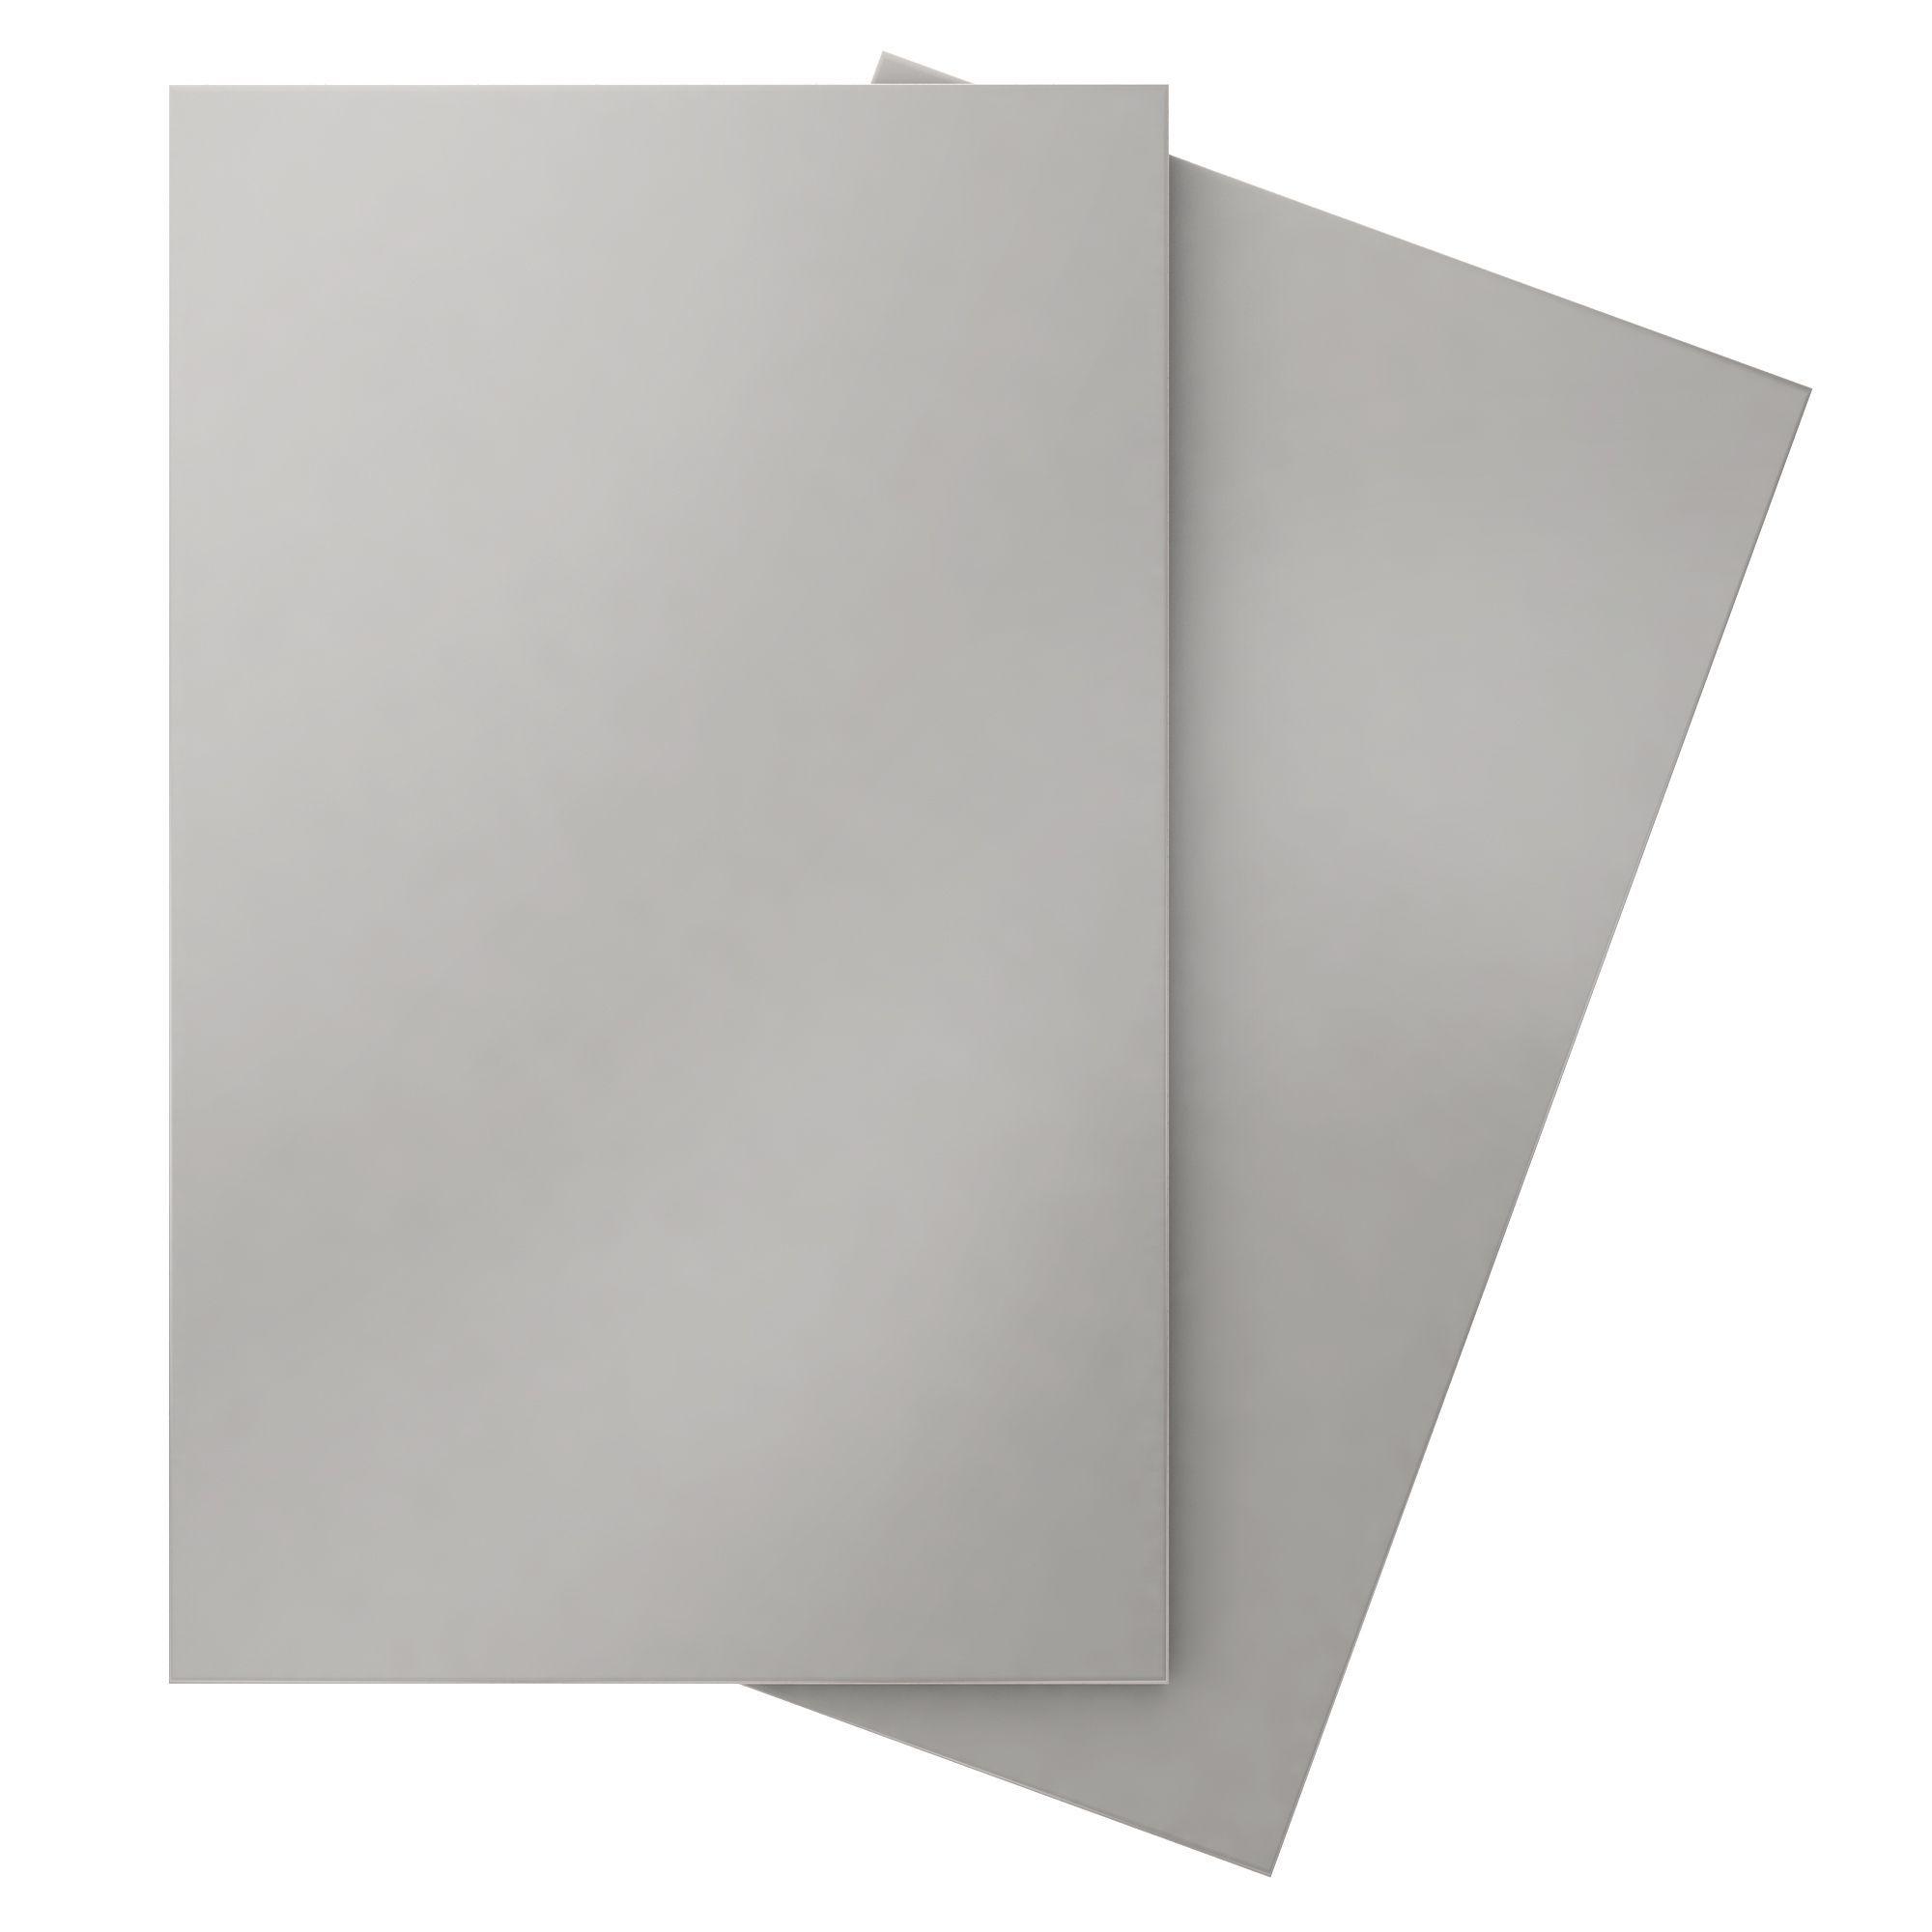 Iris grey ceramic wall tile pack of 10 l400mm w250mm iris grey ceramic wall tile pack of 10 l400mm w250mm departments diy at bq dailygadgetfo Gallery